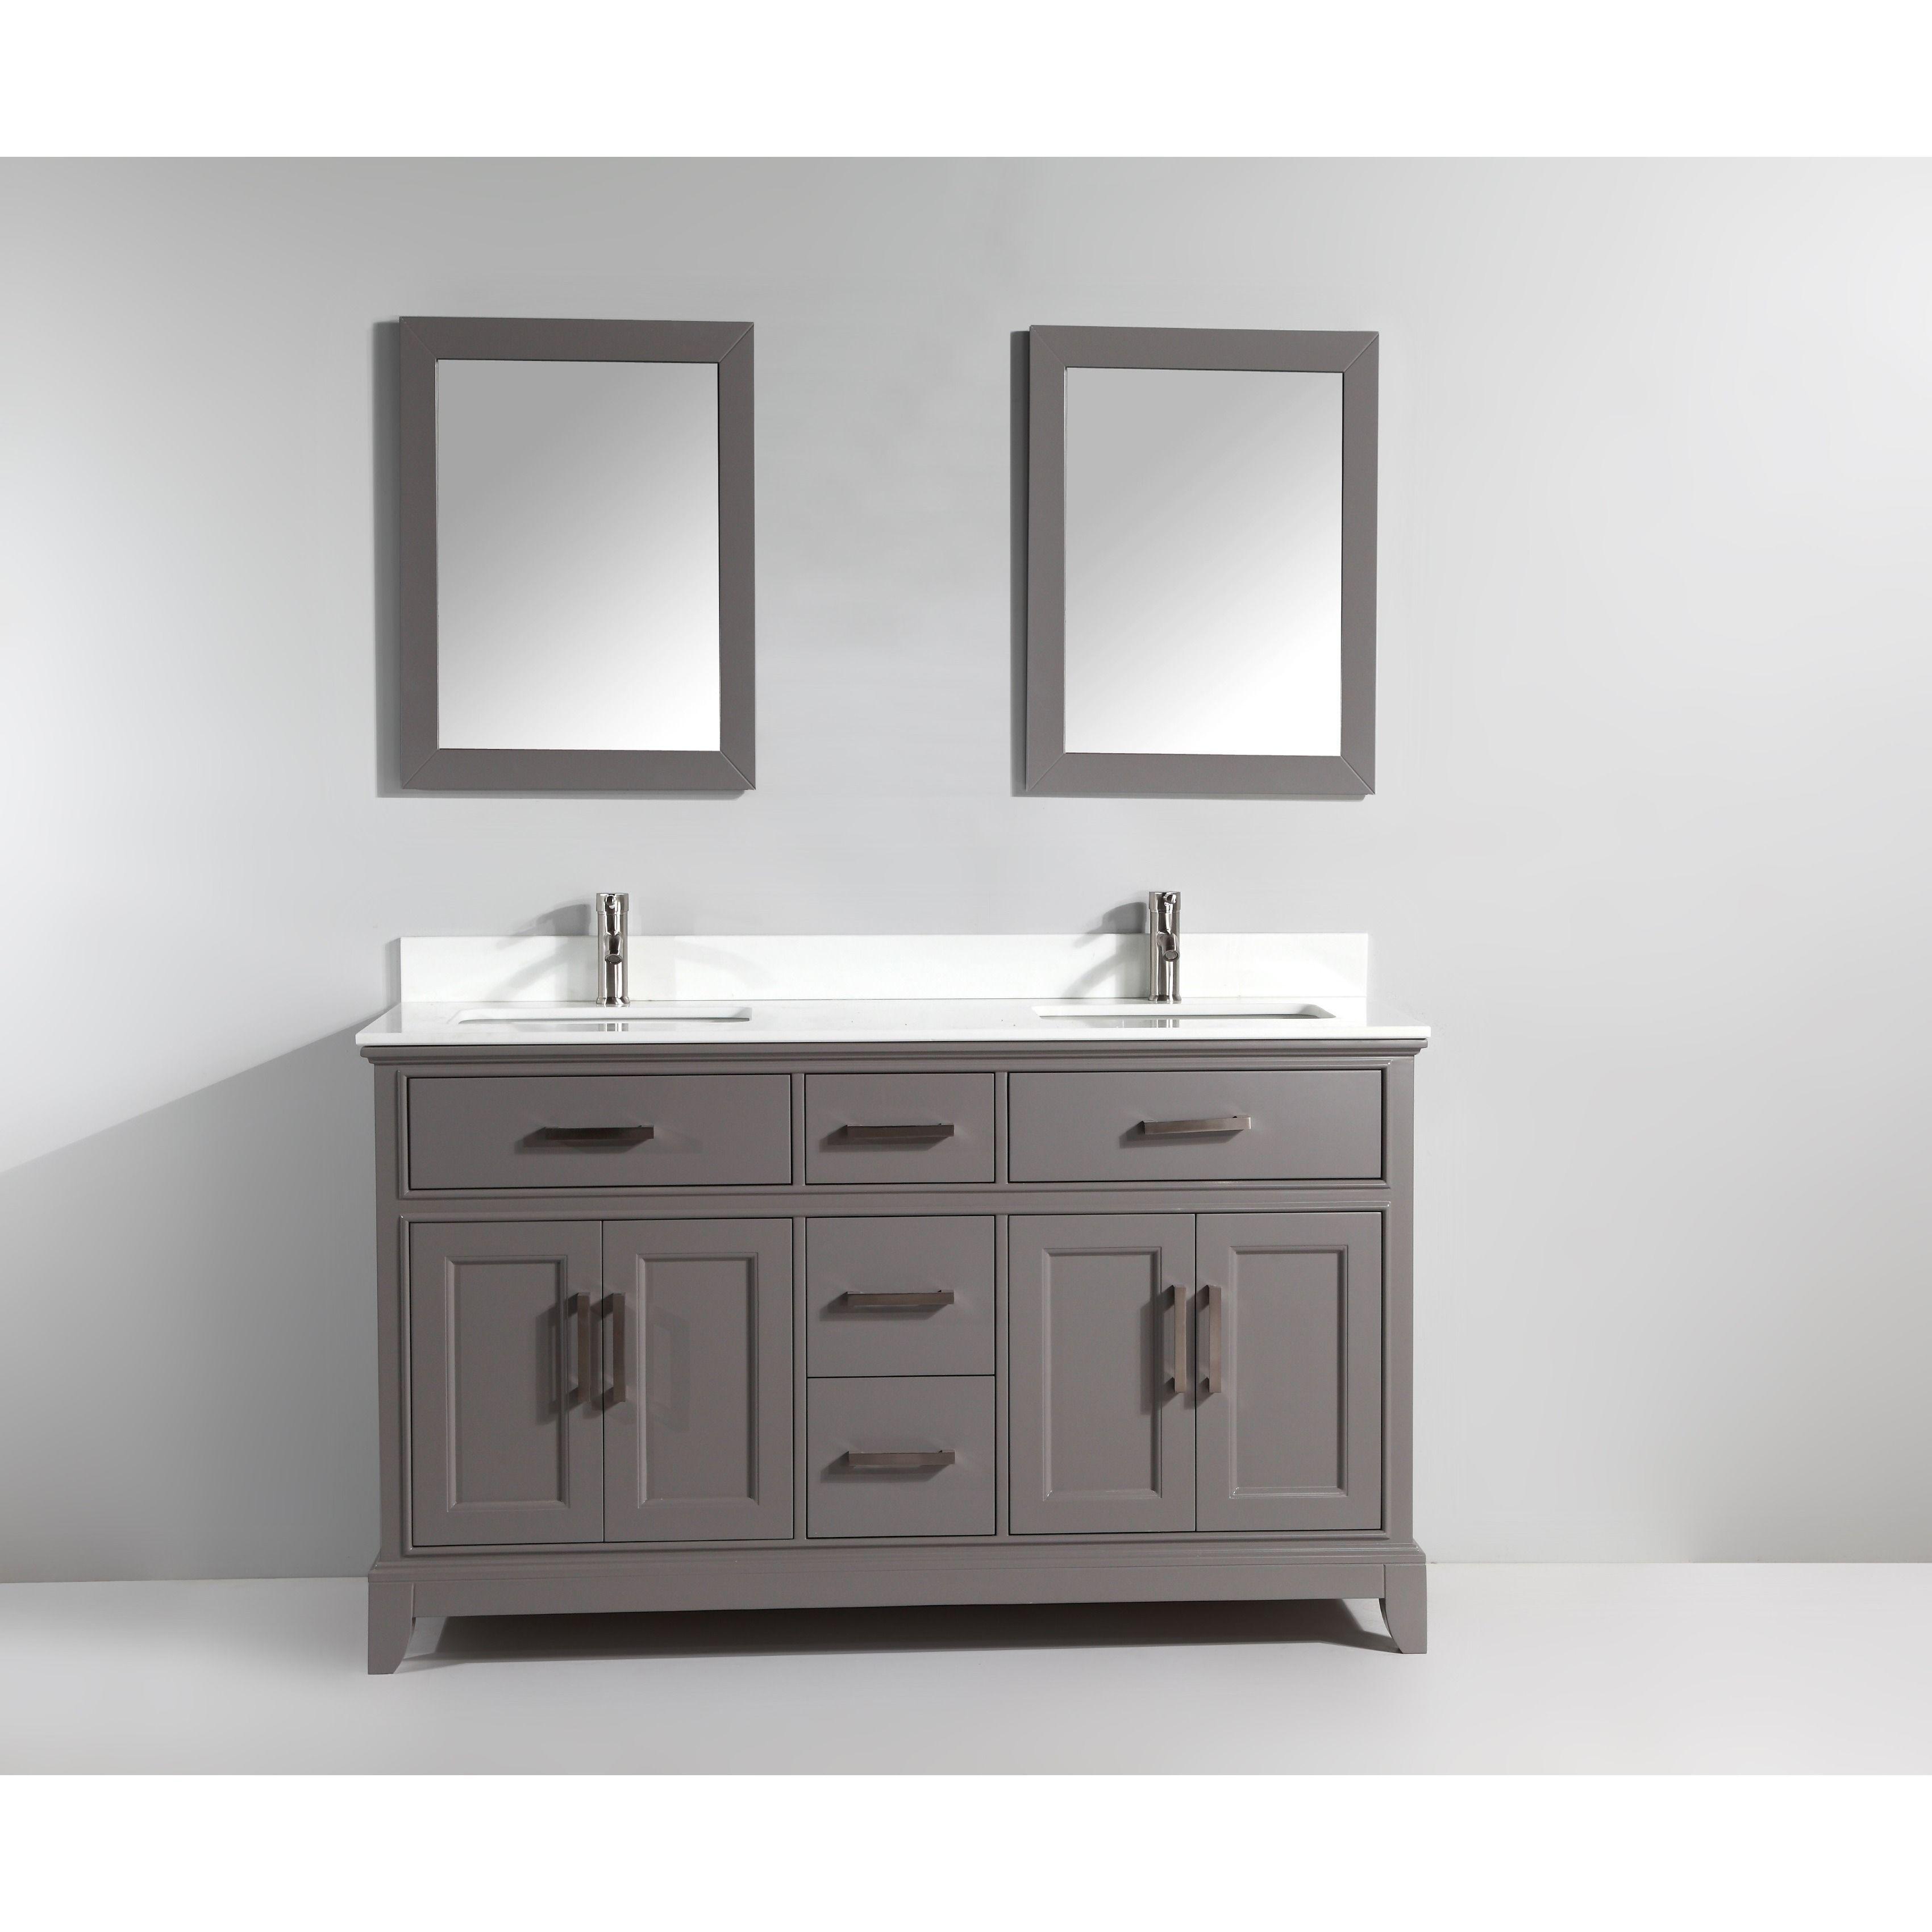 Vanity Art 72 Double Sink Bathroom Vanity Set Super White Phoenix